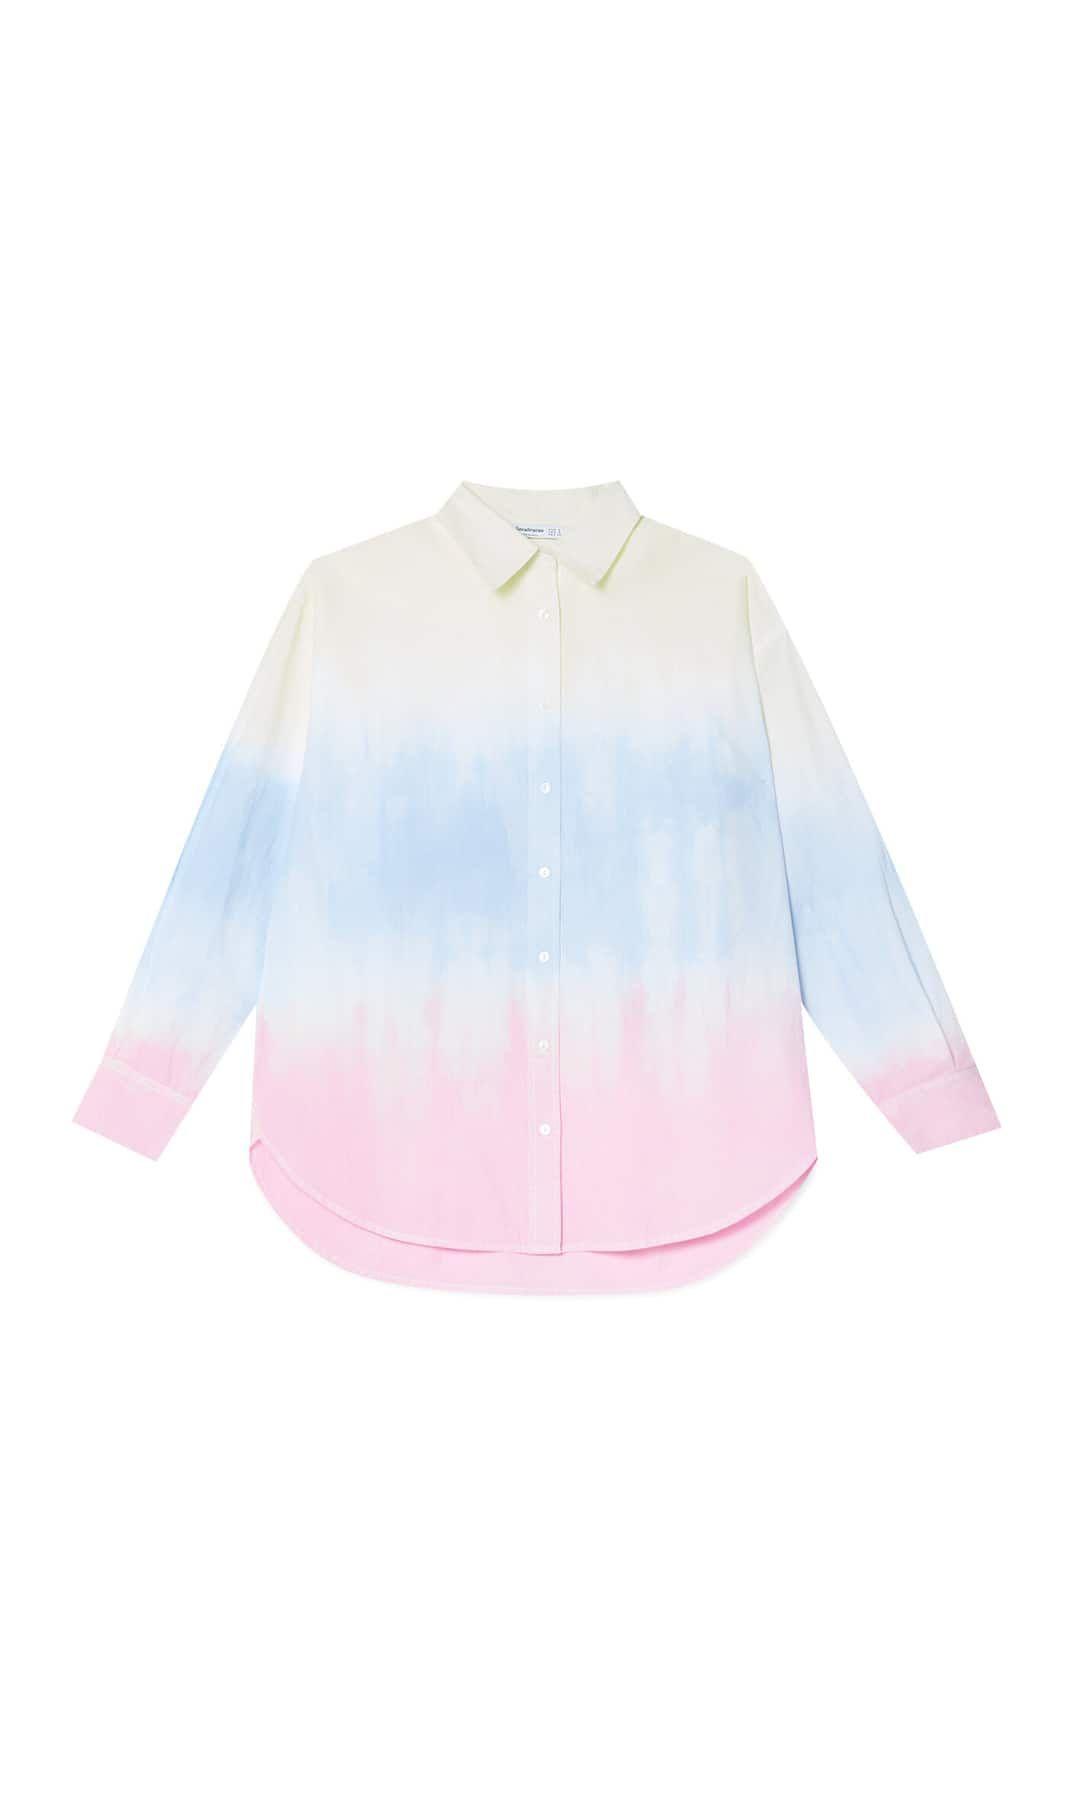 #PopbelaOOTD: Tambah Koleksi Baju Tie-dye yang Kekinian di Minggu Ini